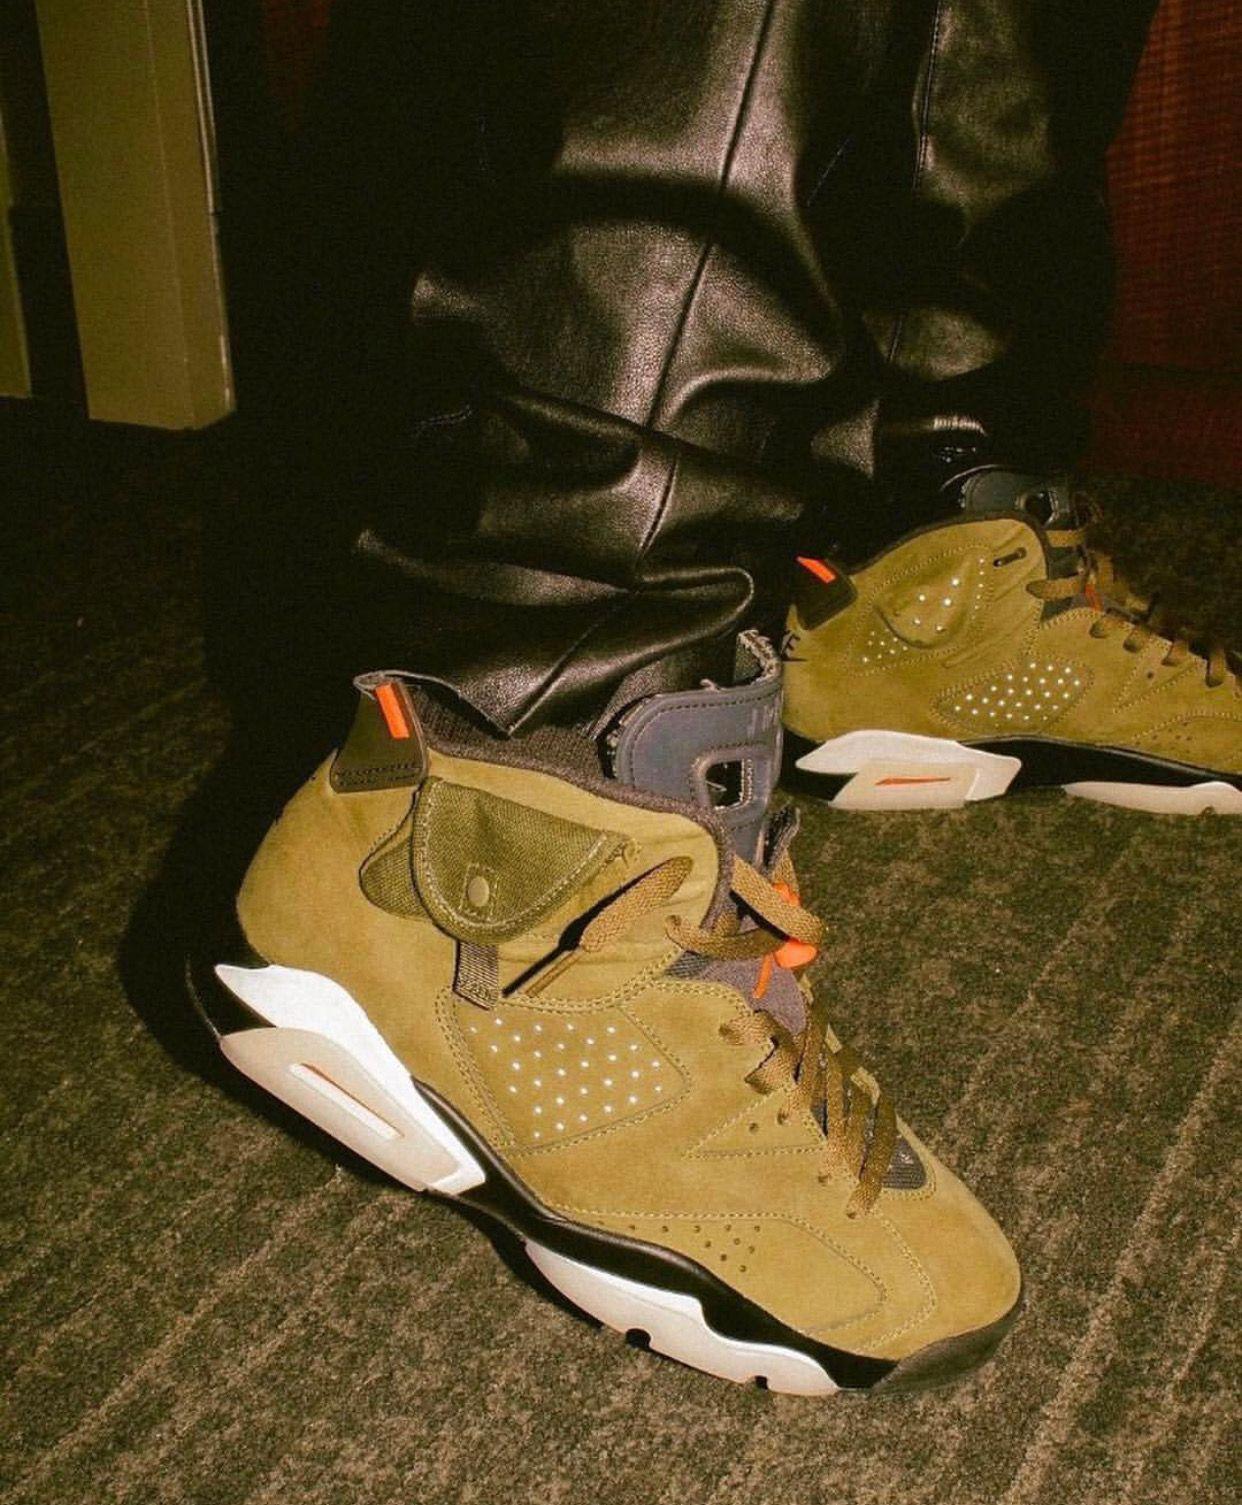 Jordan 6 Travis Scott Air Jordans Retro Shoes Sneakers